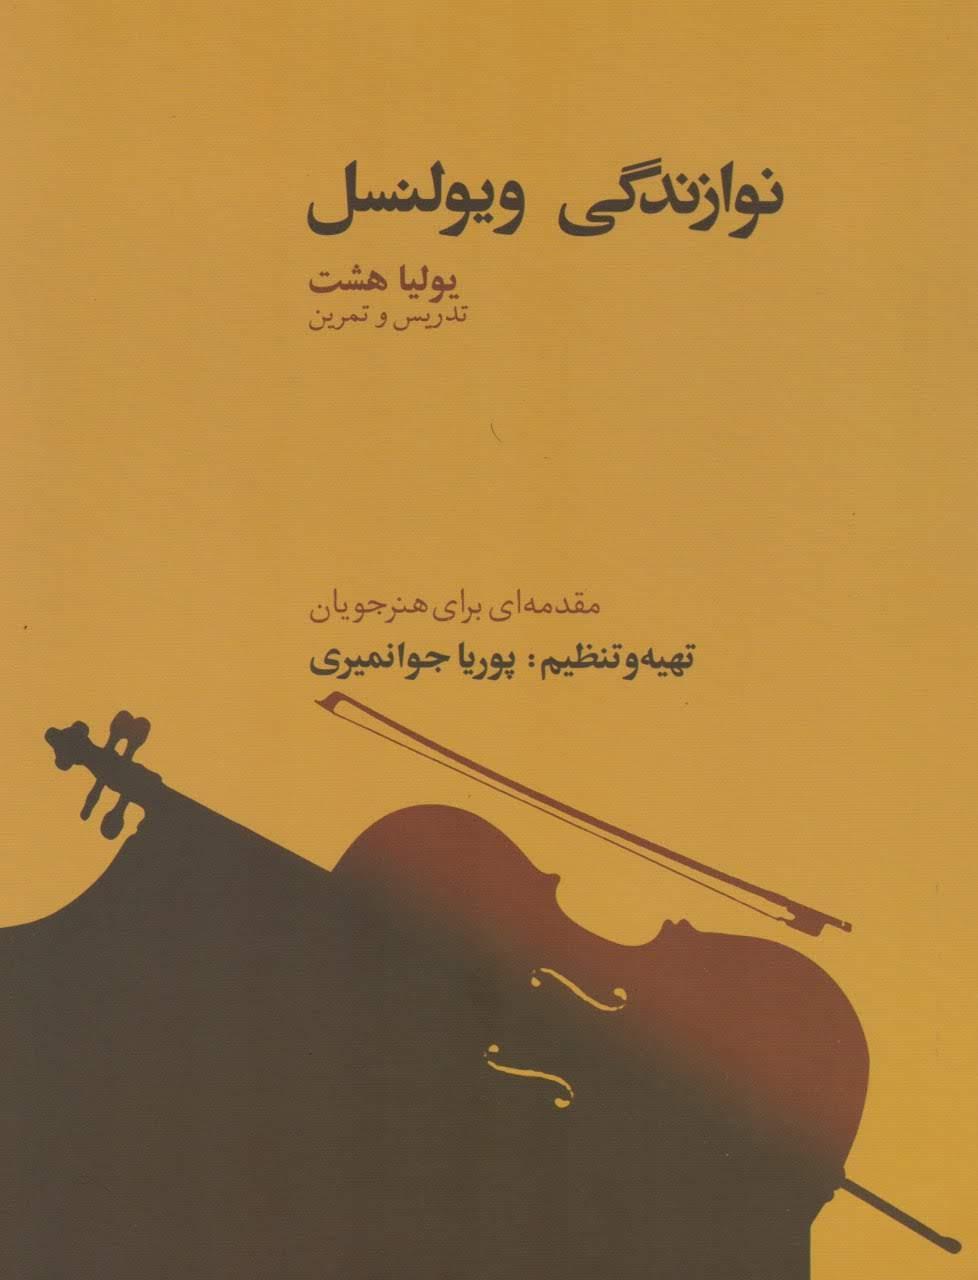 کتاب نوازندگی ویولنسل یولیا هشت پوریا جوانمیری انتشارات پوریا